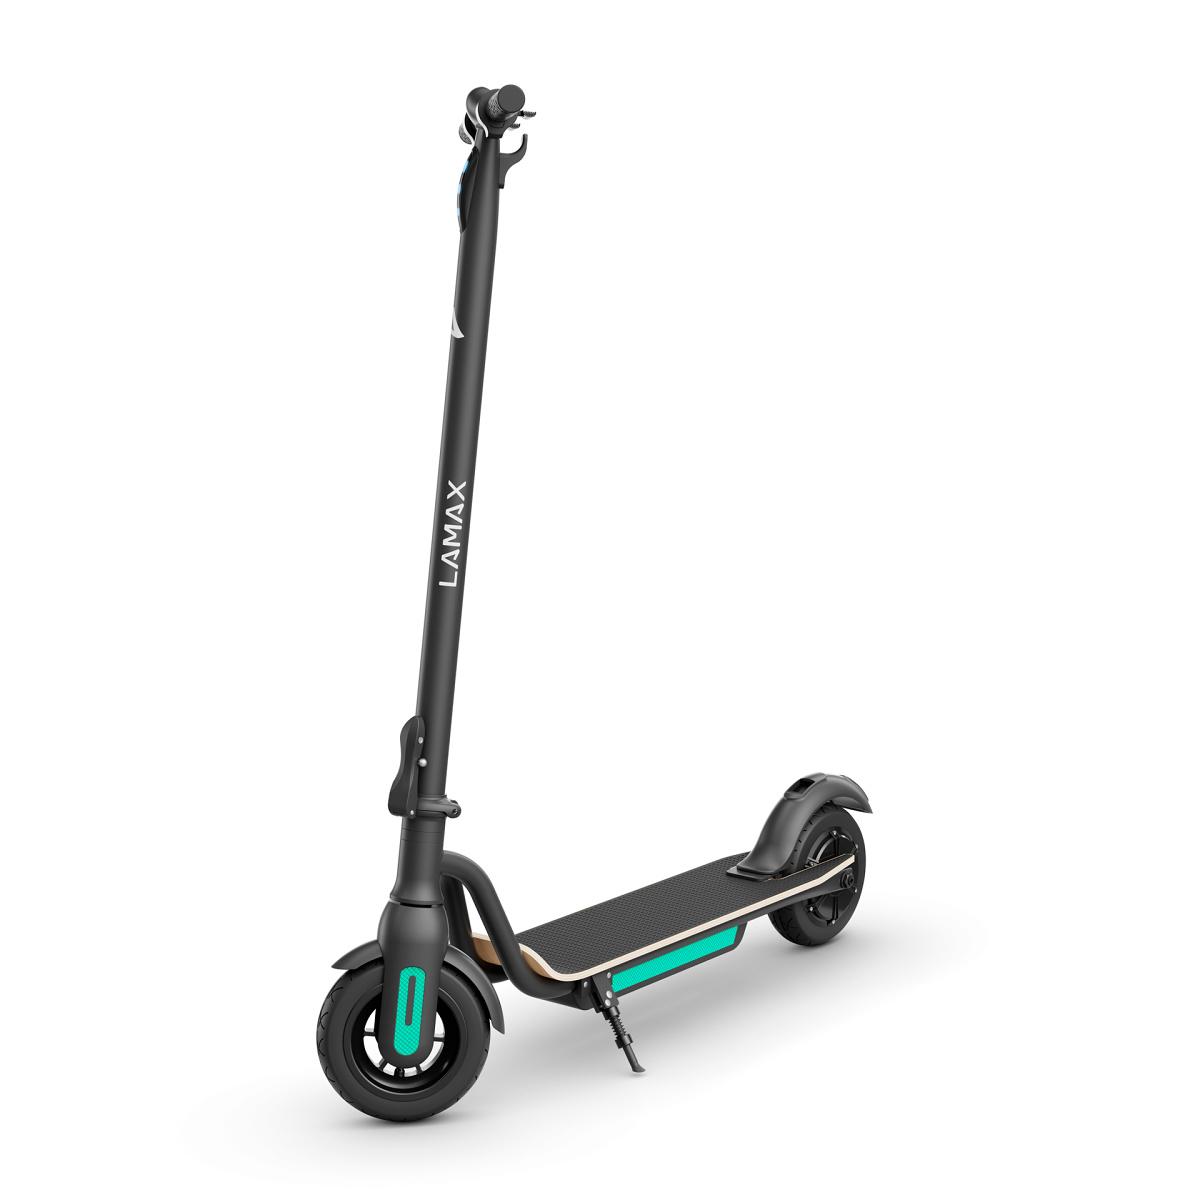 LAMAX E-scooter S7500 - Omiń korki i zabaw się!